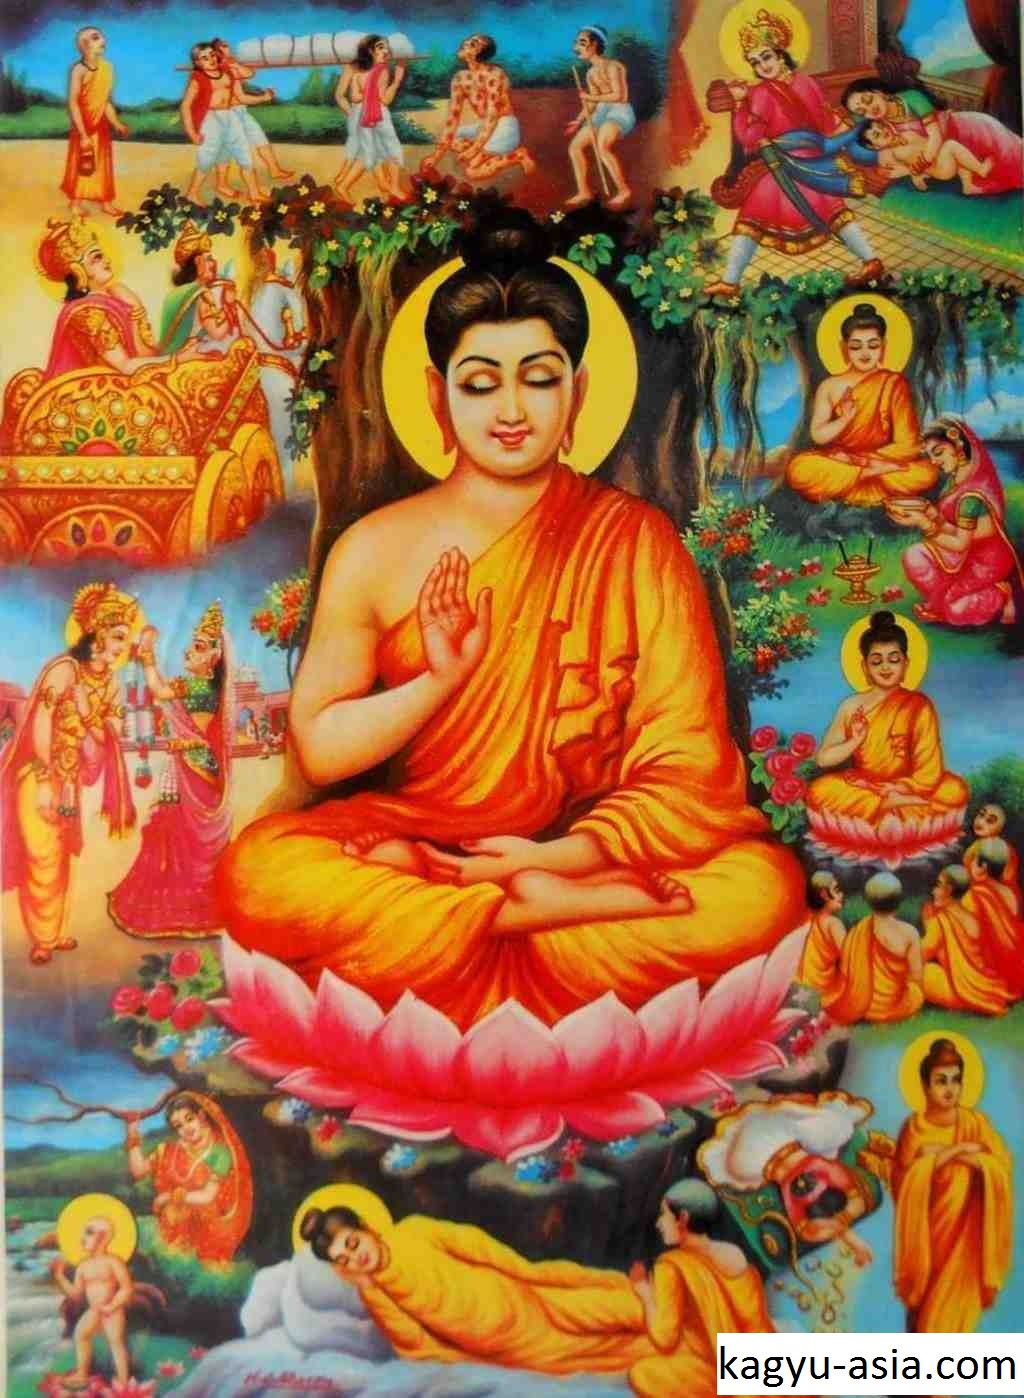 Biografi Pendiri dan Penyebar Agama Buddha, Siddharta Gautama